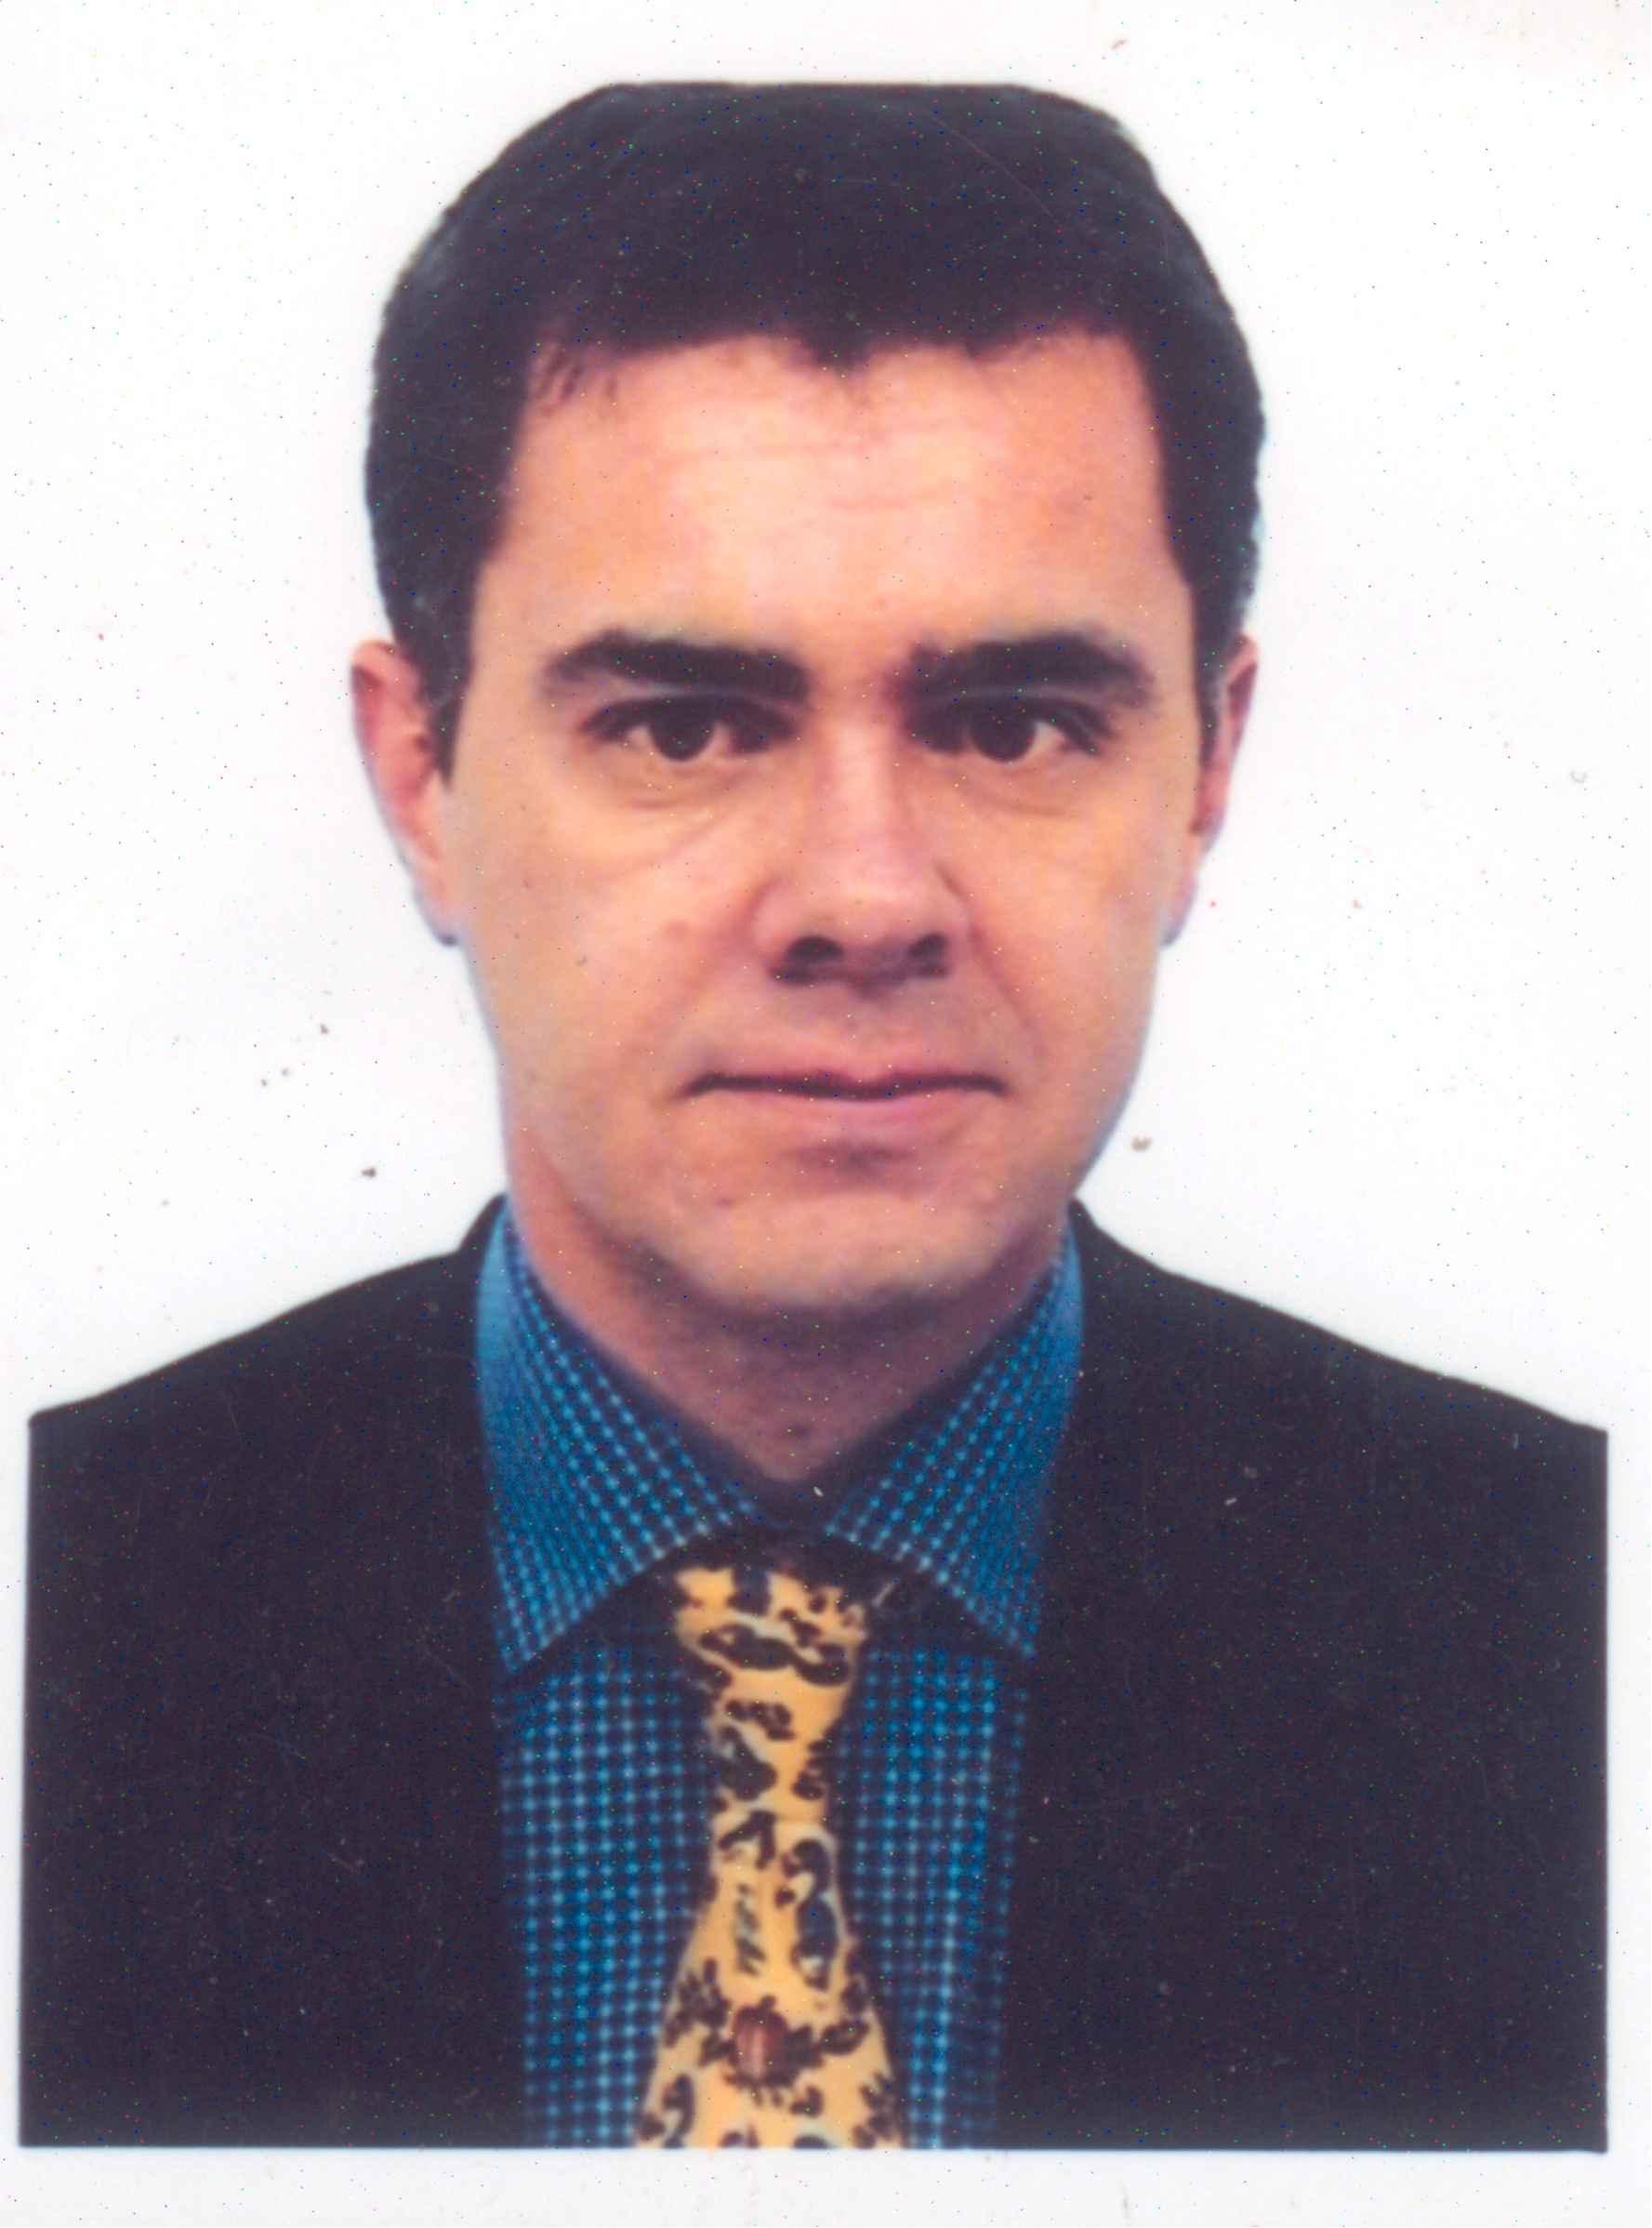 cv consultant infor m3